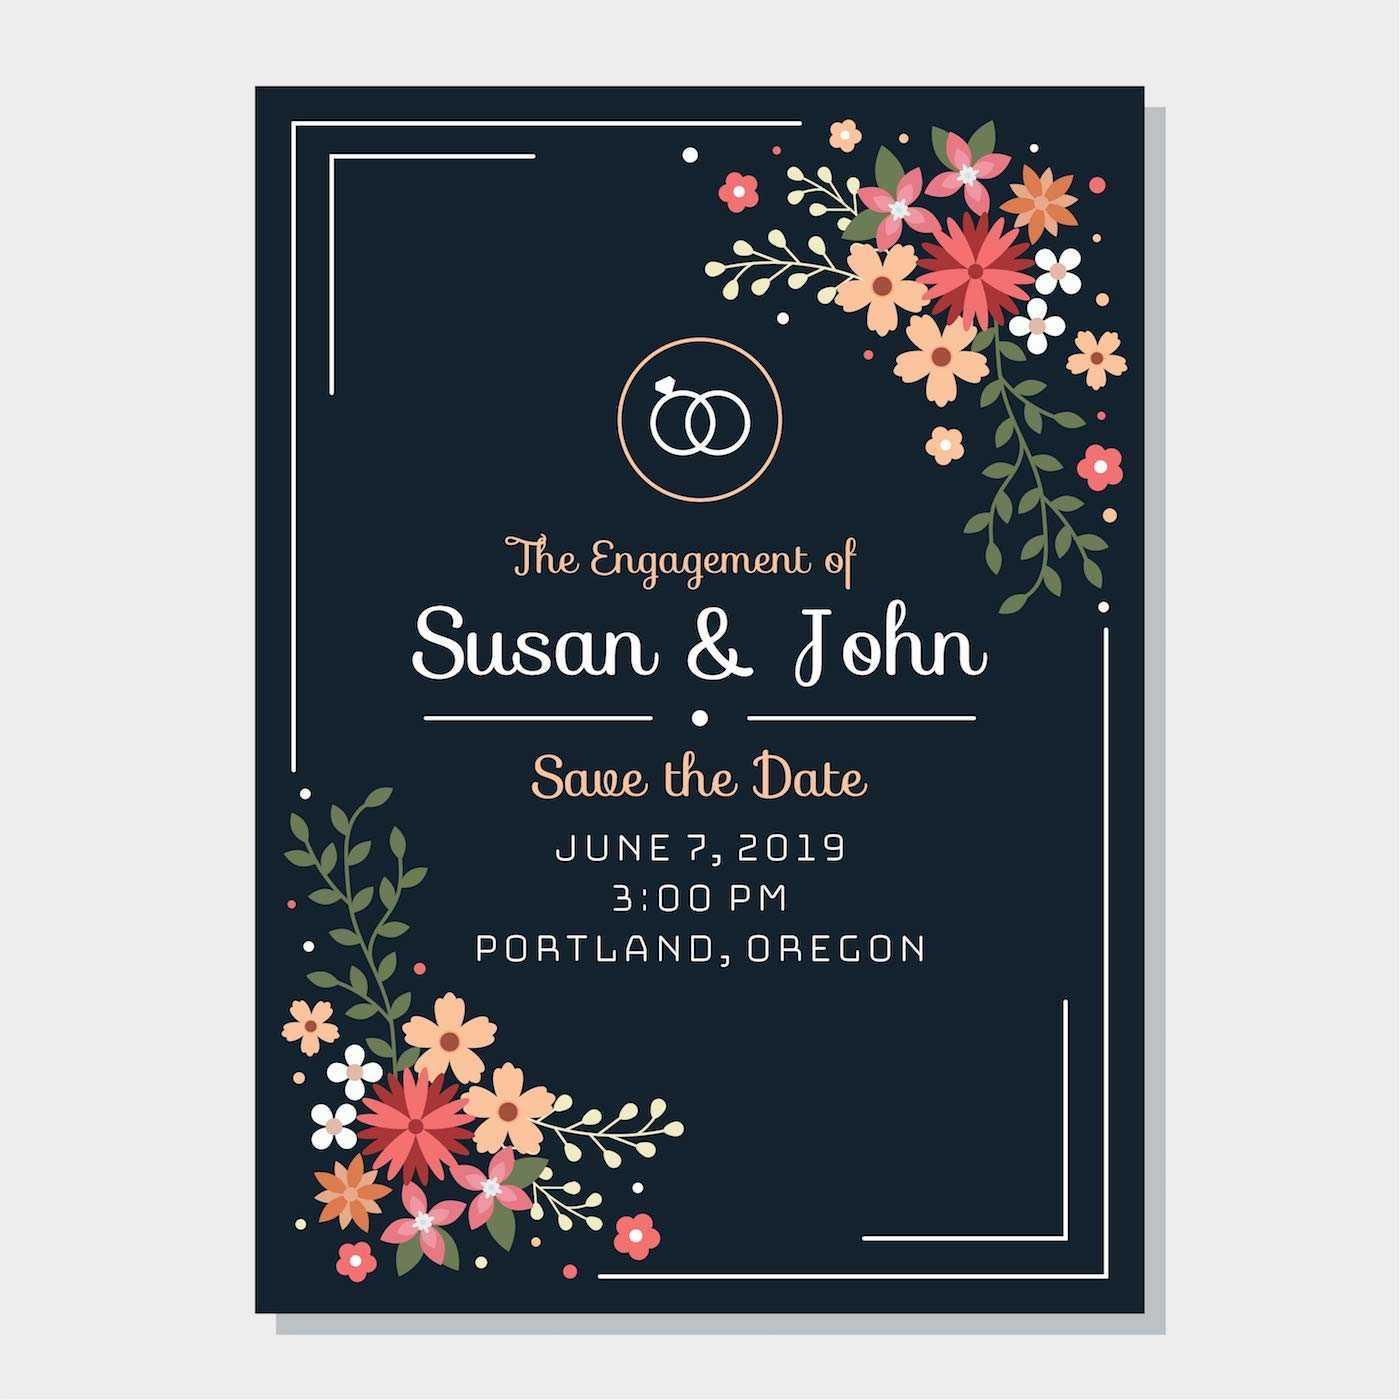 Engagement Invitation Free Vector Art - (888 Free Downloads) In Engagement Invitation Card Template